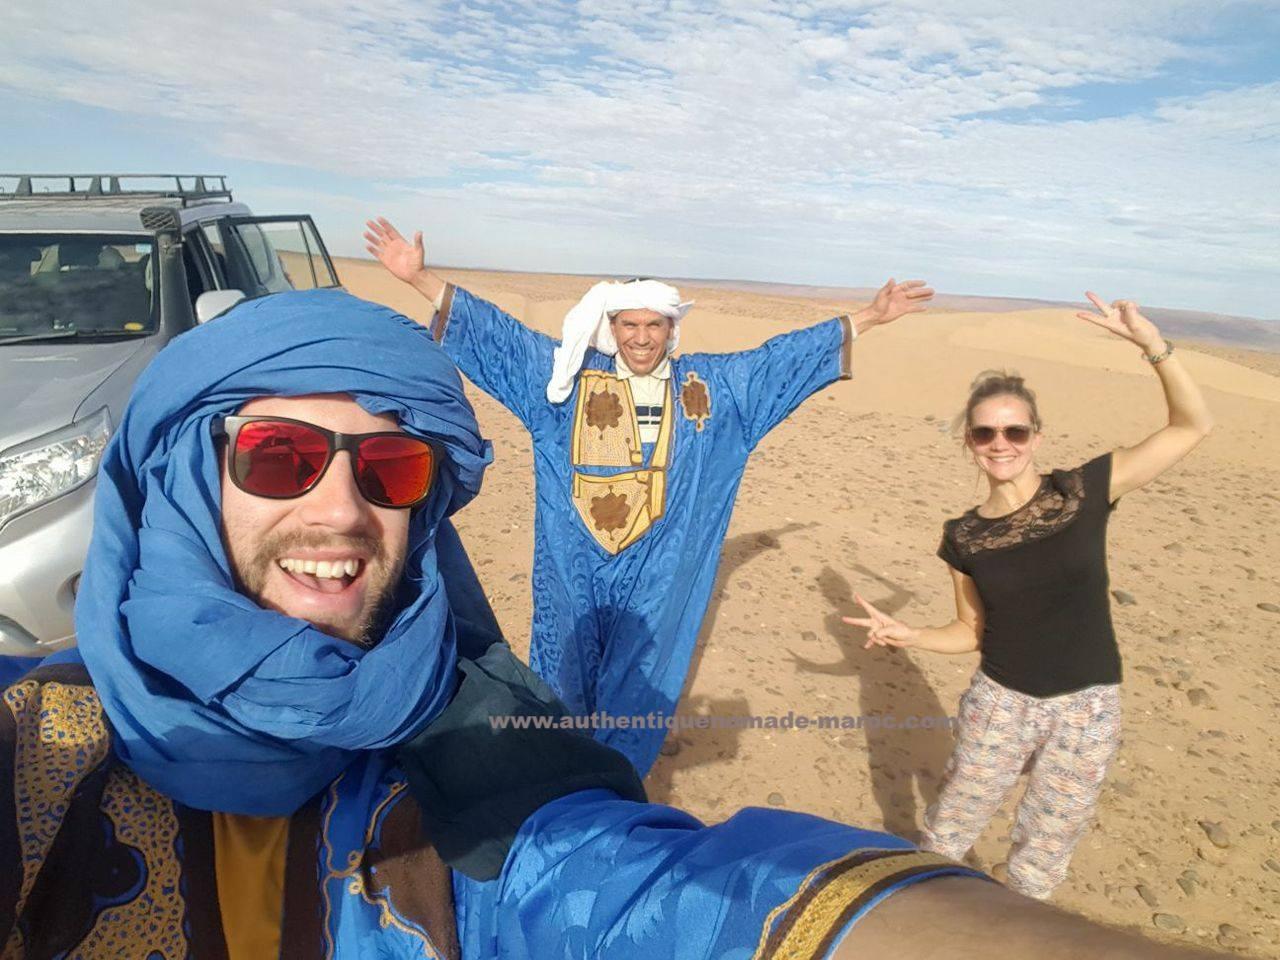 4x4 trip désert maroc